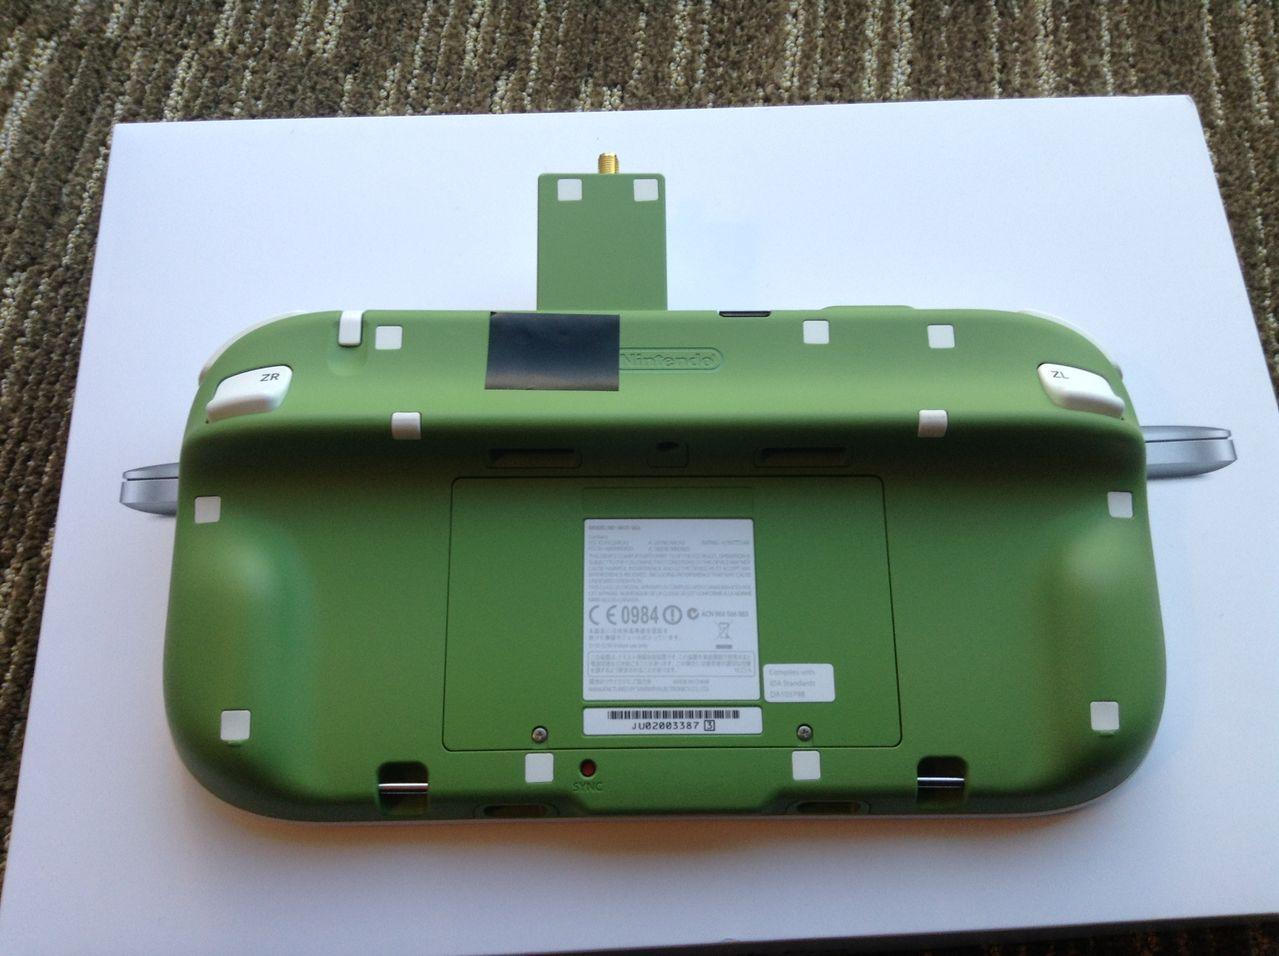 Wii U Dev Kit Fotos Gamefront De